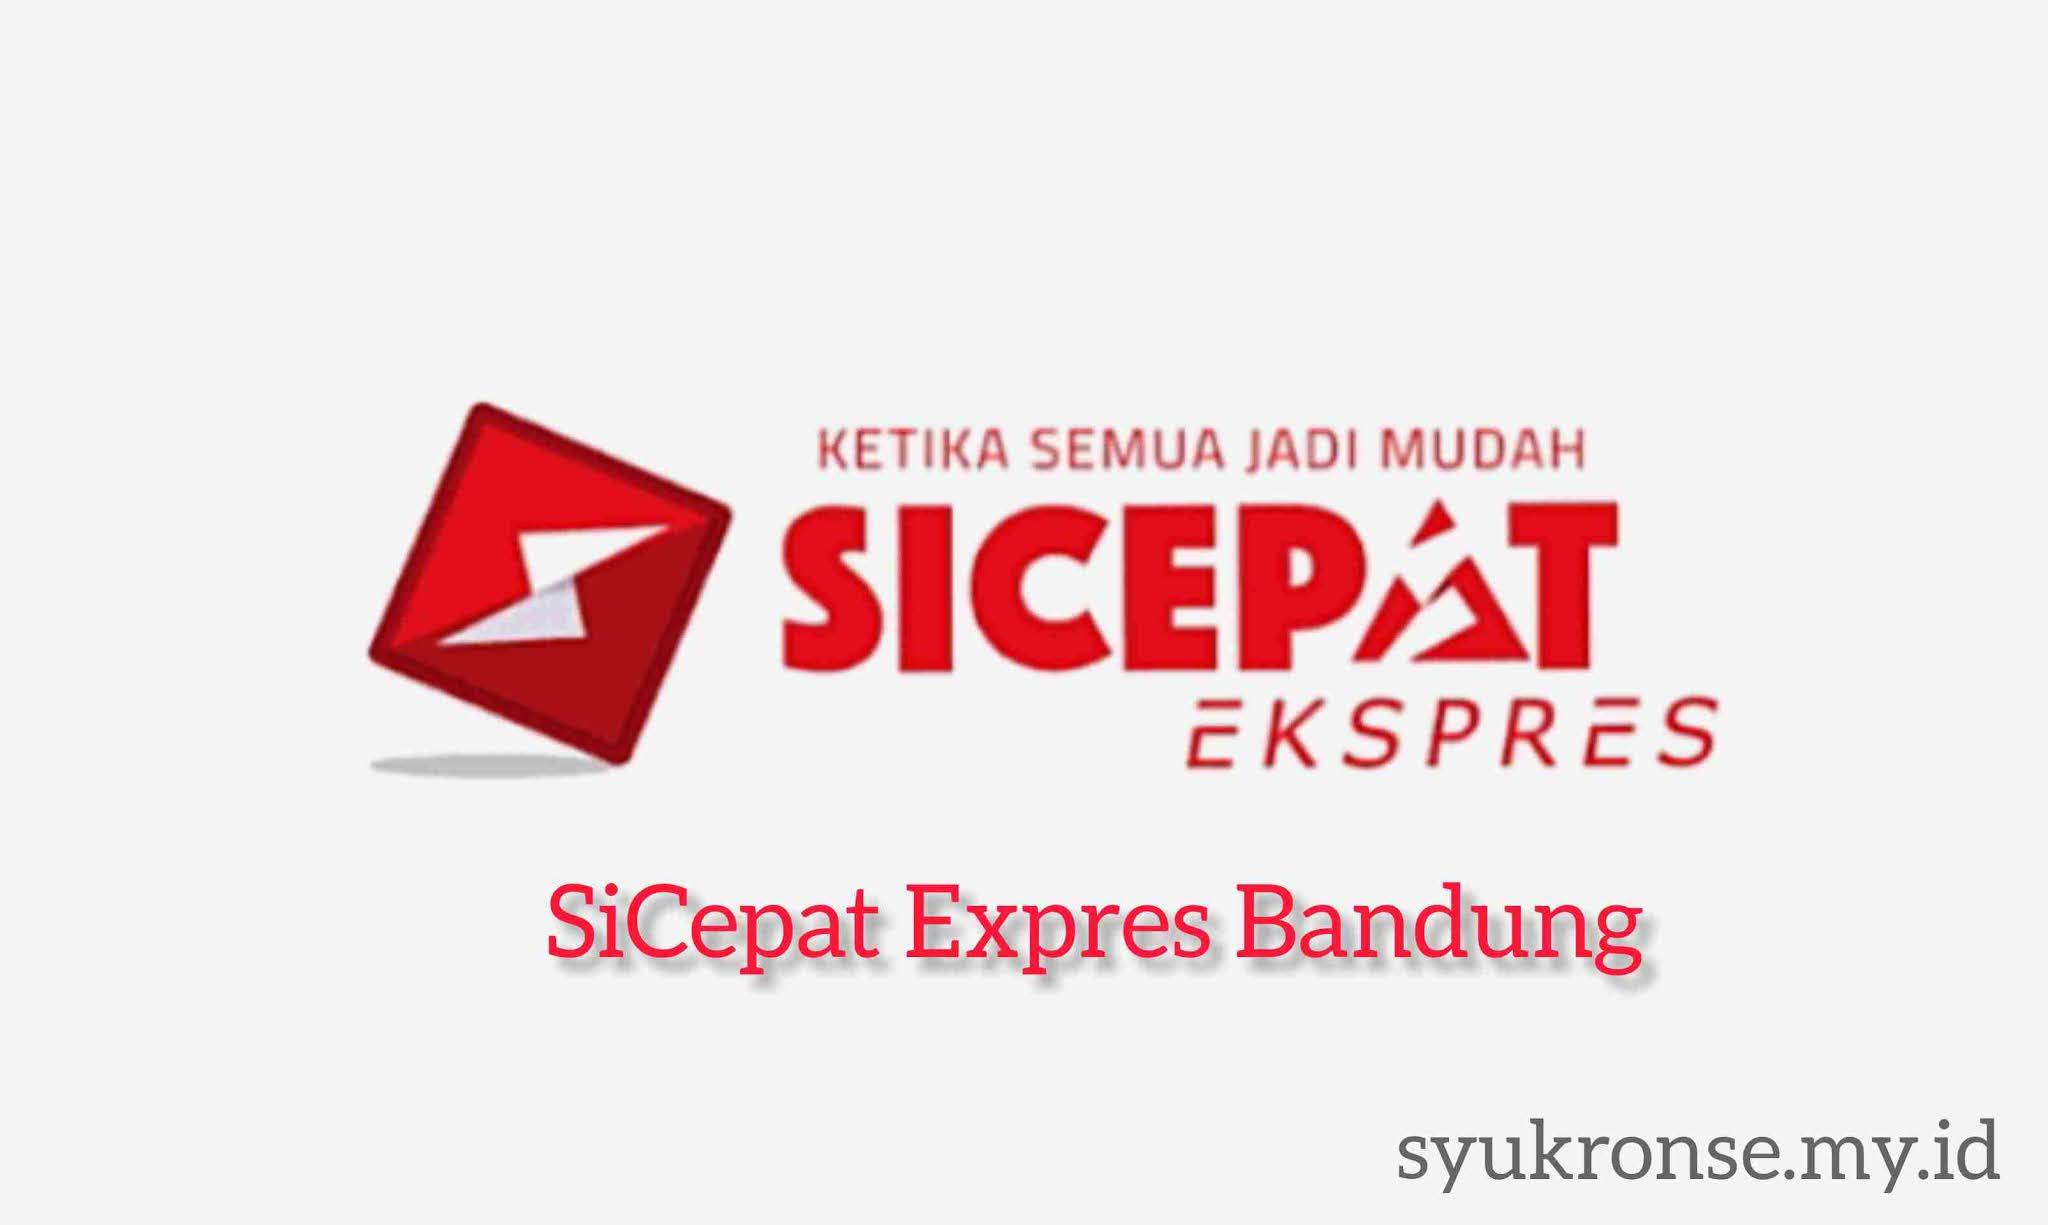 SiCepat Bandung